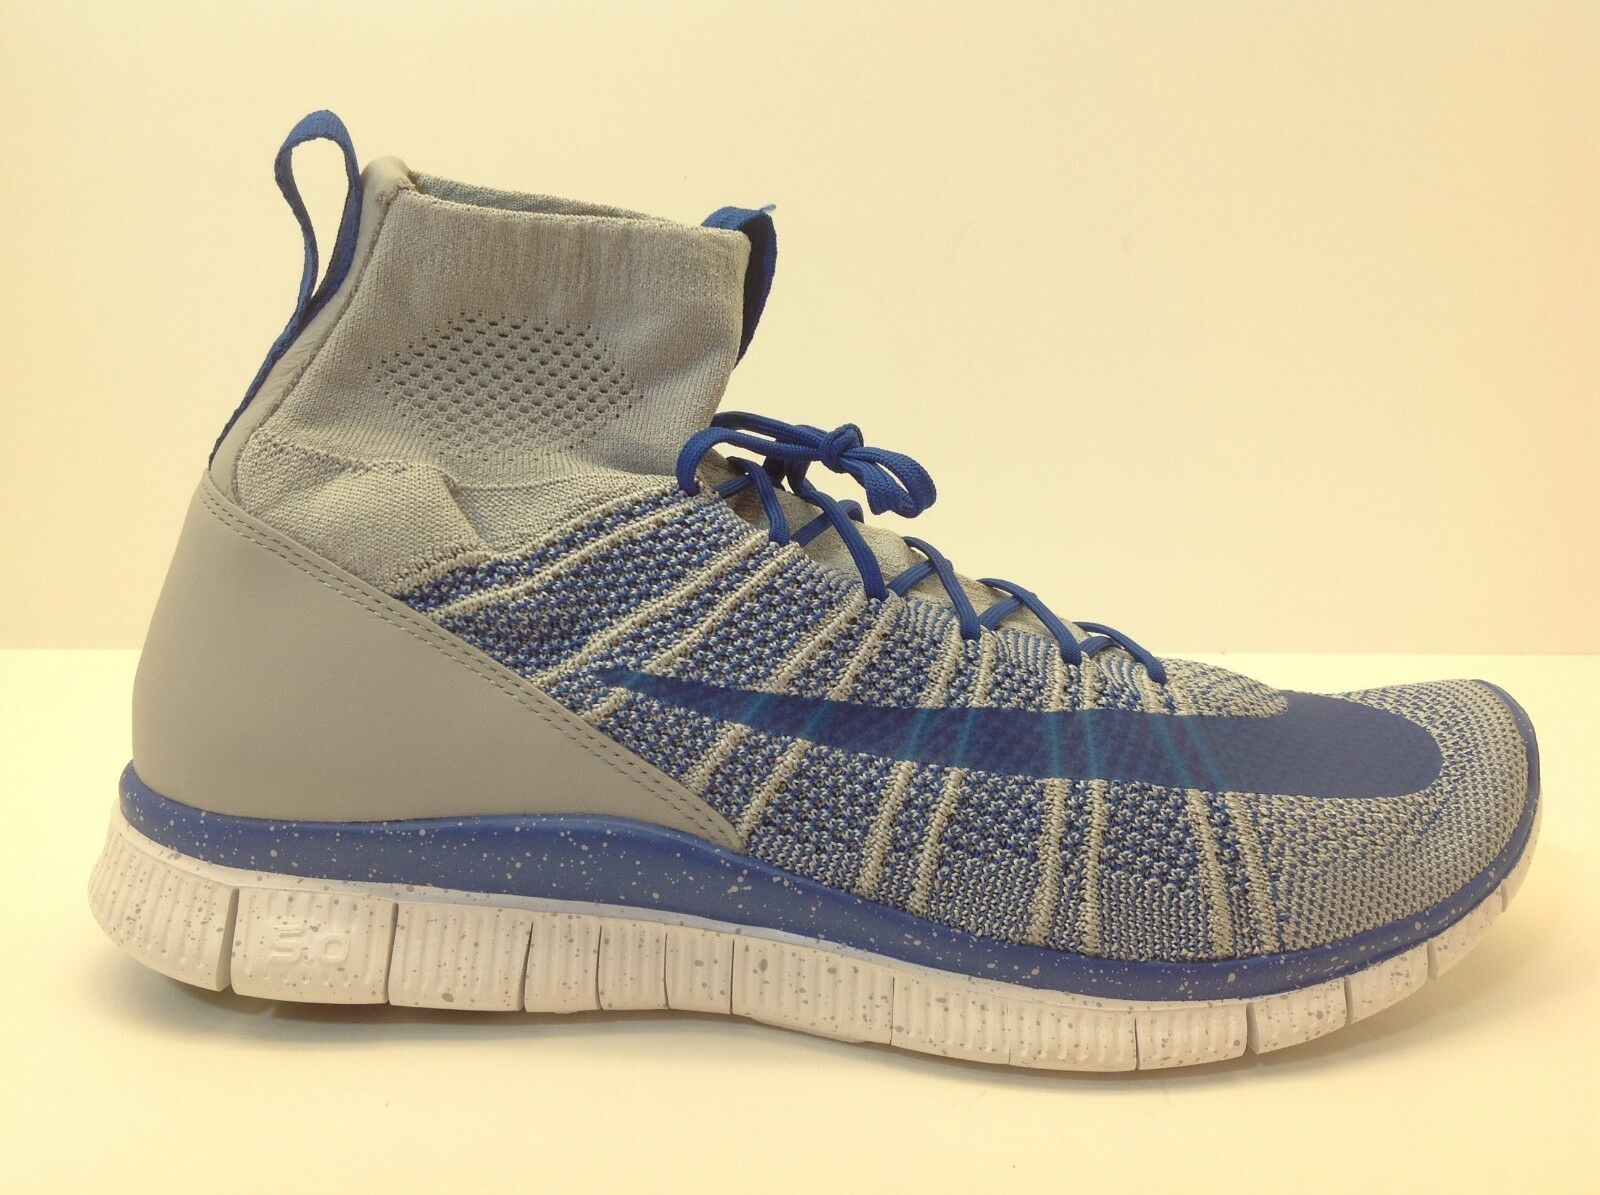 Nike free box flyknit sprunghafter 11-11.5 new in box free kein deckel 805554 003 356cb6